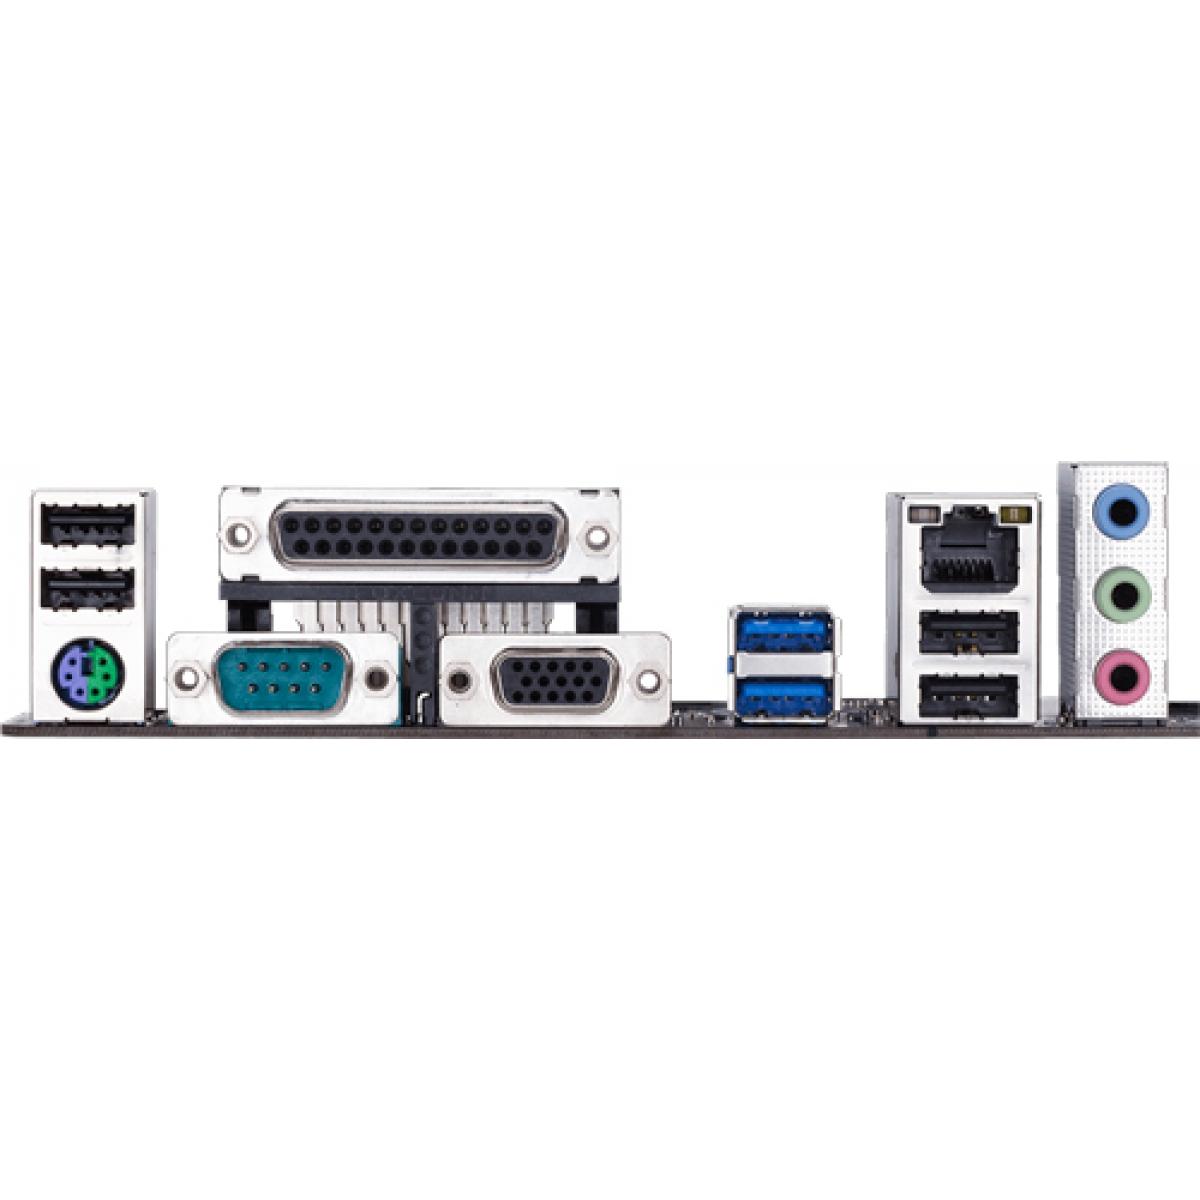 PLACA MÃE Gigabyte H310M-DS2, Chipset H310, Intel LGA 1151, mATX, DDR4